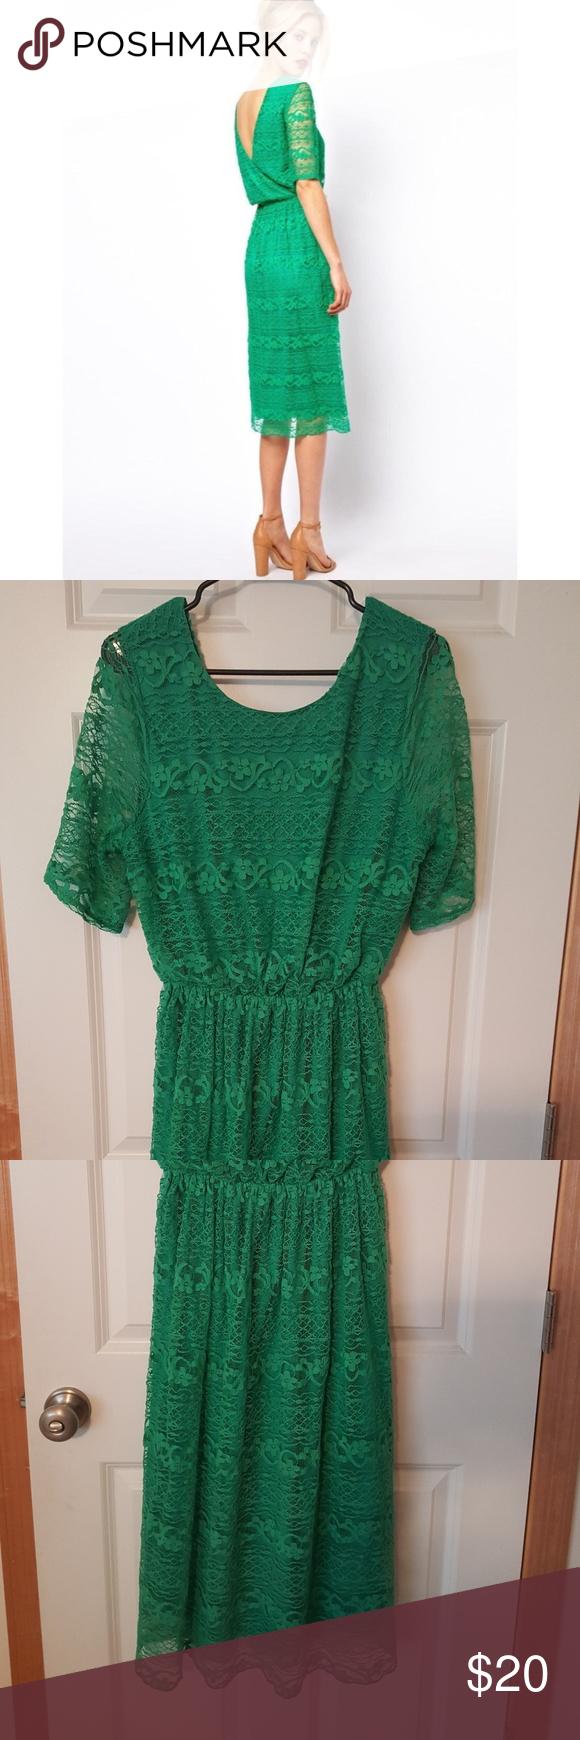 Makeup with mint green dress  ASOS Mint Green Lace Dress  My Posh Picks  Pinterest  Animal